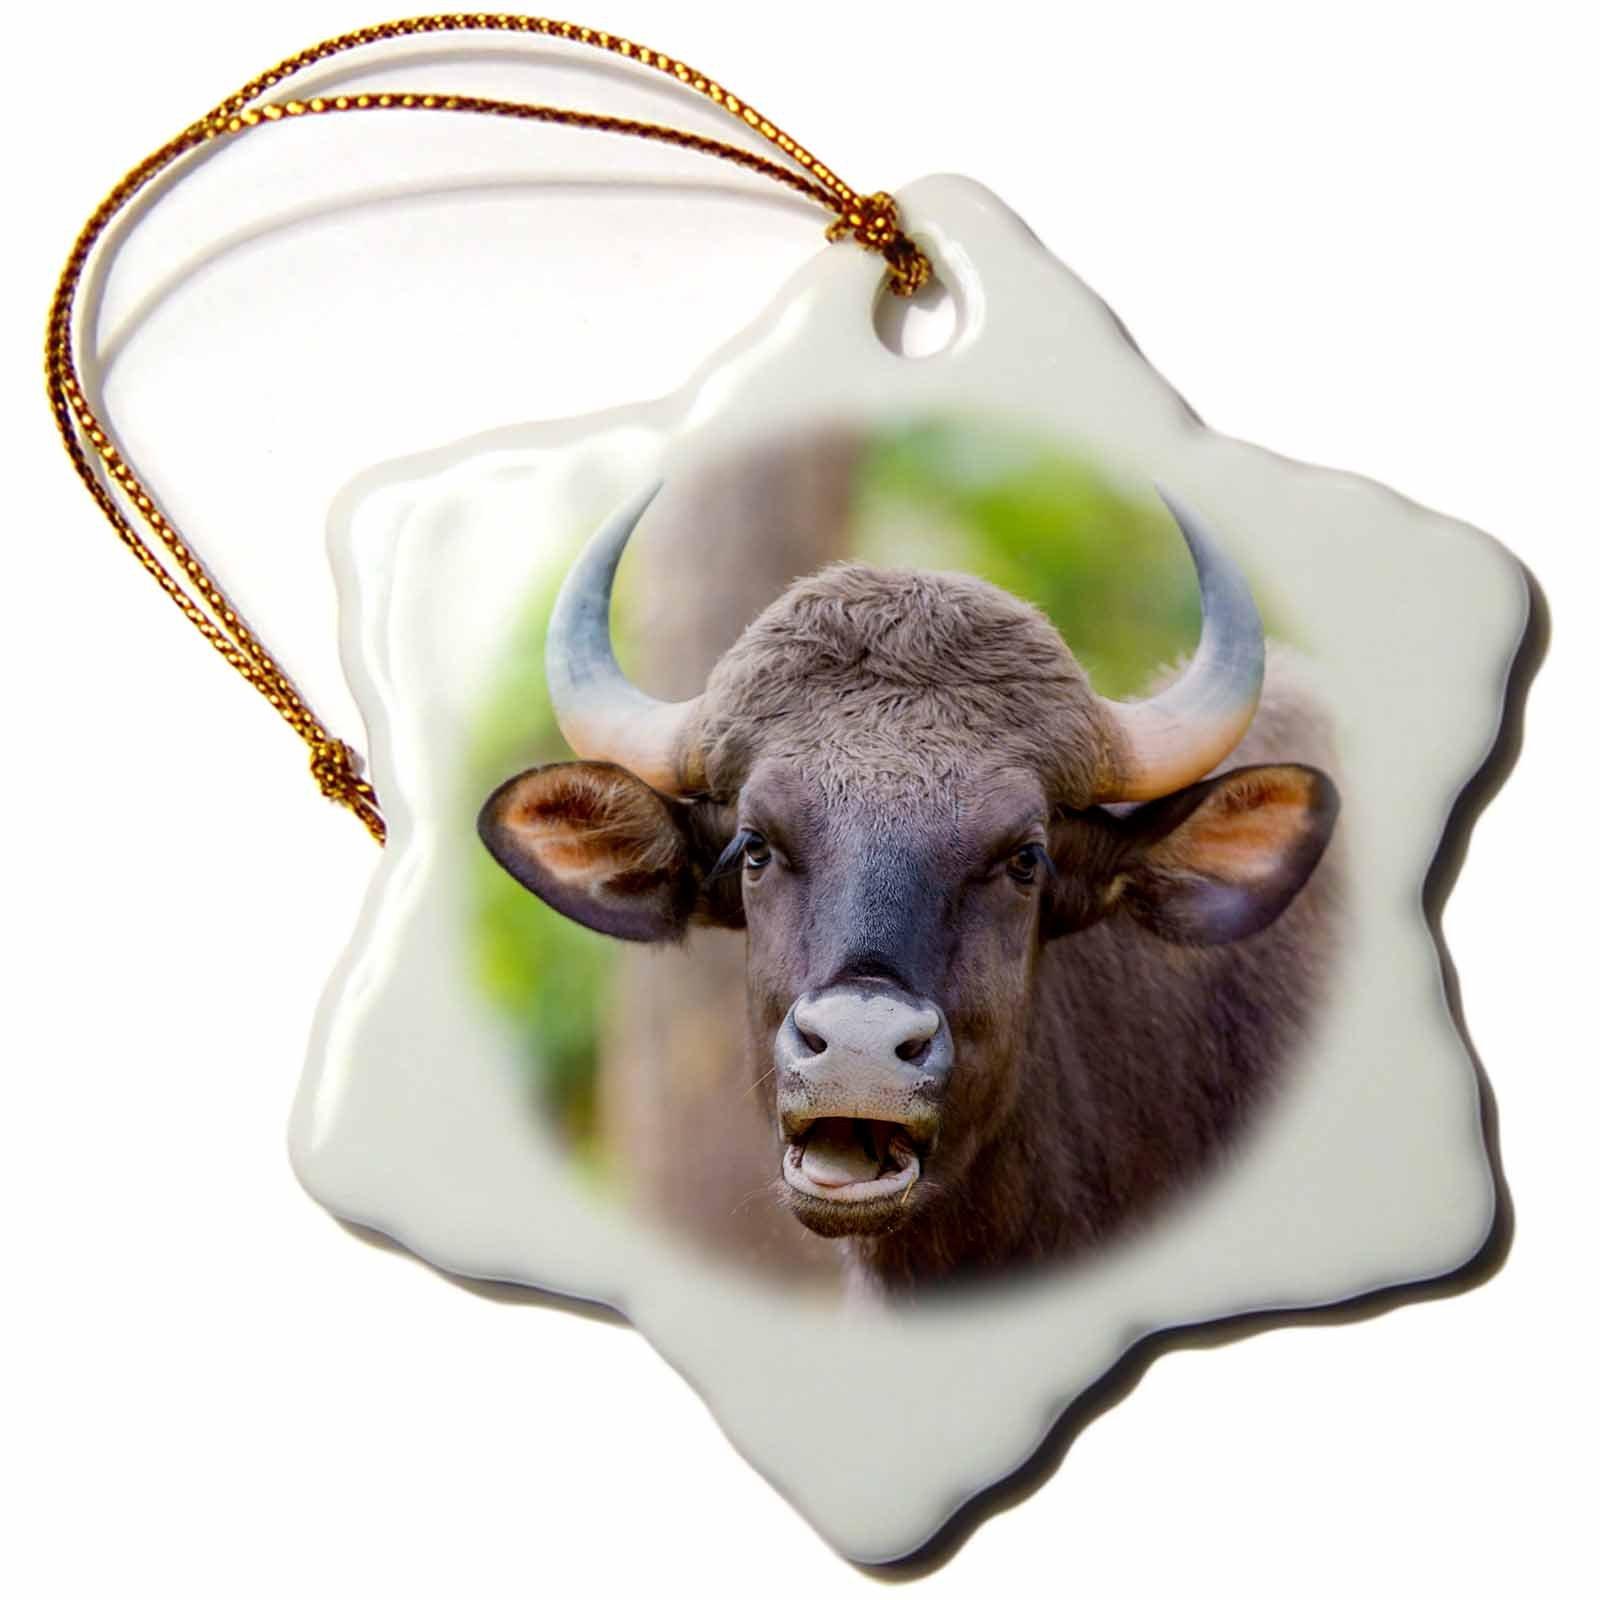 3dRose Danita Delimont - Cattle - India. Gaur, Kanha tiger reserve, Indian wild bison portrait. - 3 inch Snowflake Porcelain Ornament (orn_276818_1)